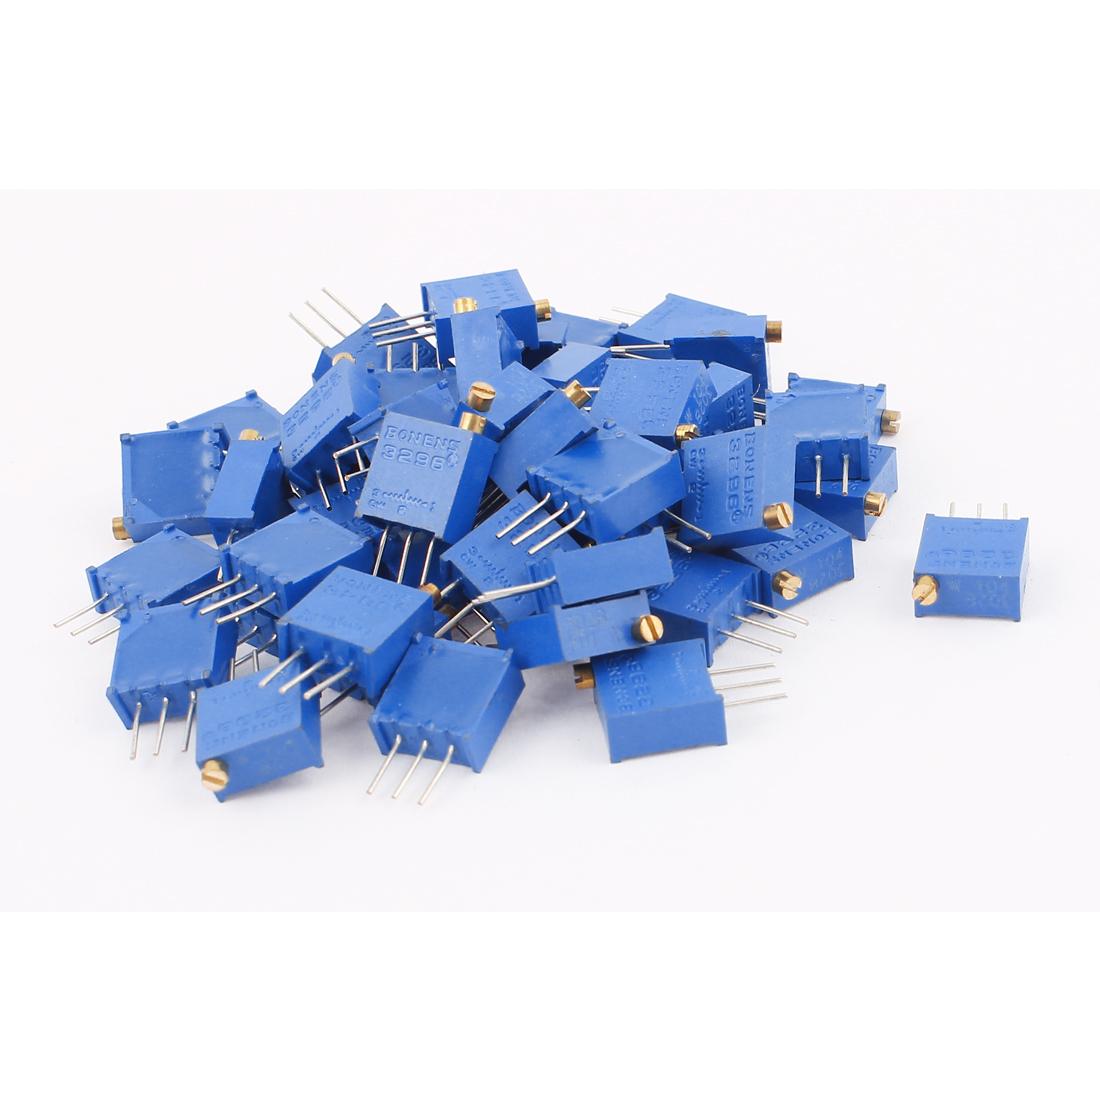 50Pcs 3296W-104 100K Ohm Resistor Trim Pot Potentiometer Trimmer Blue